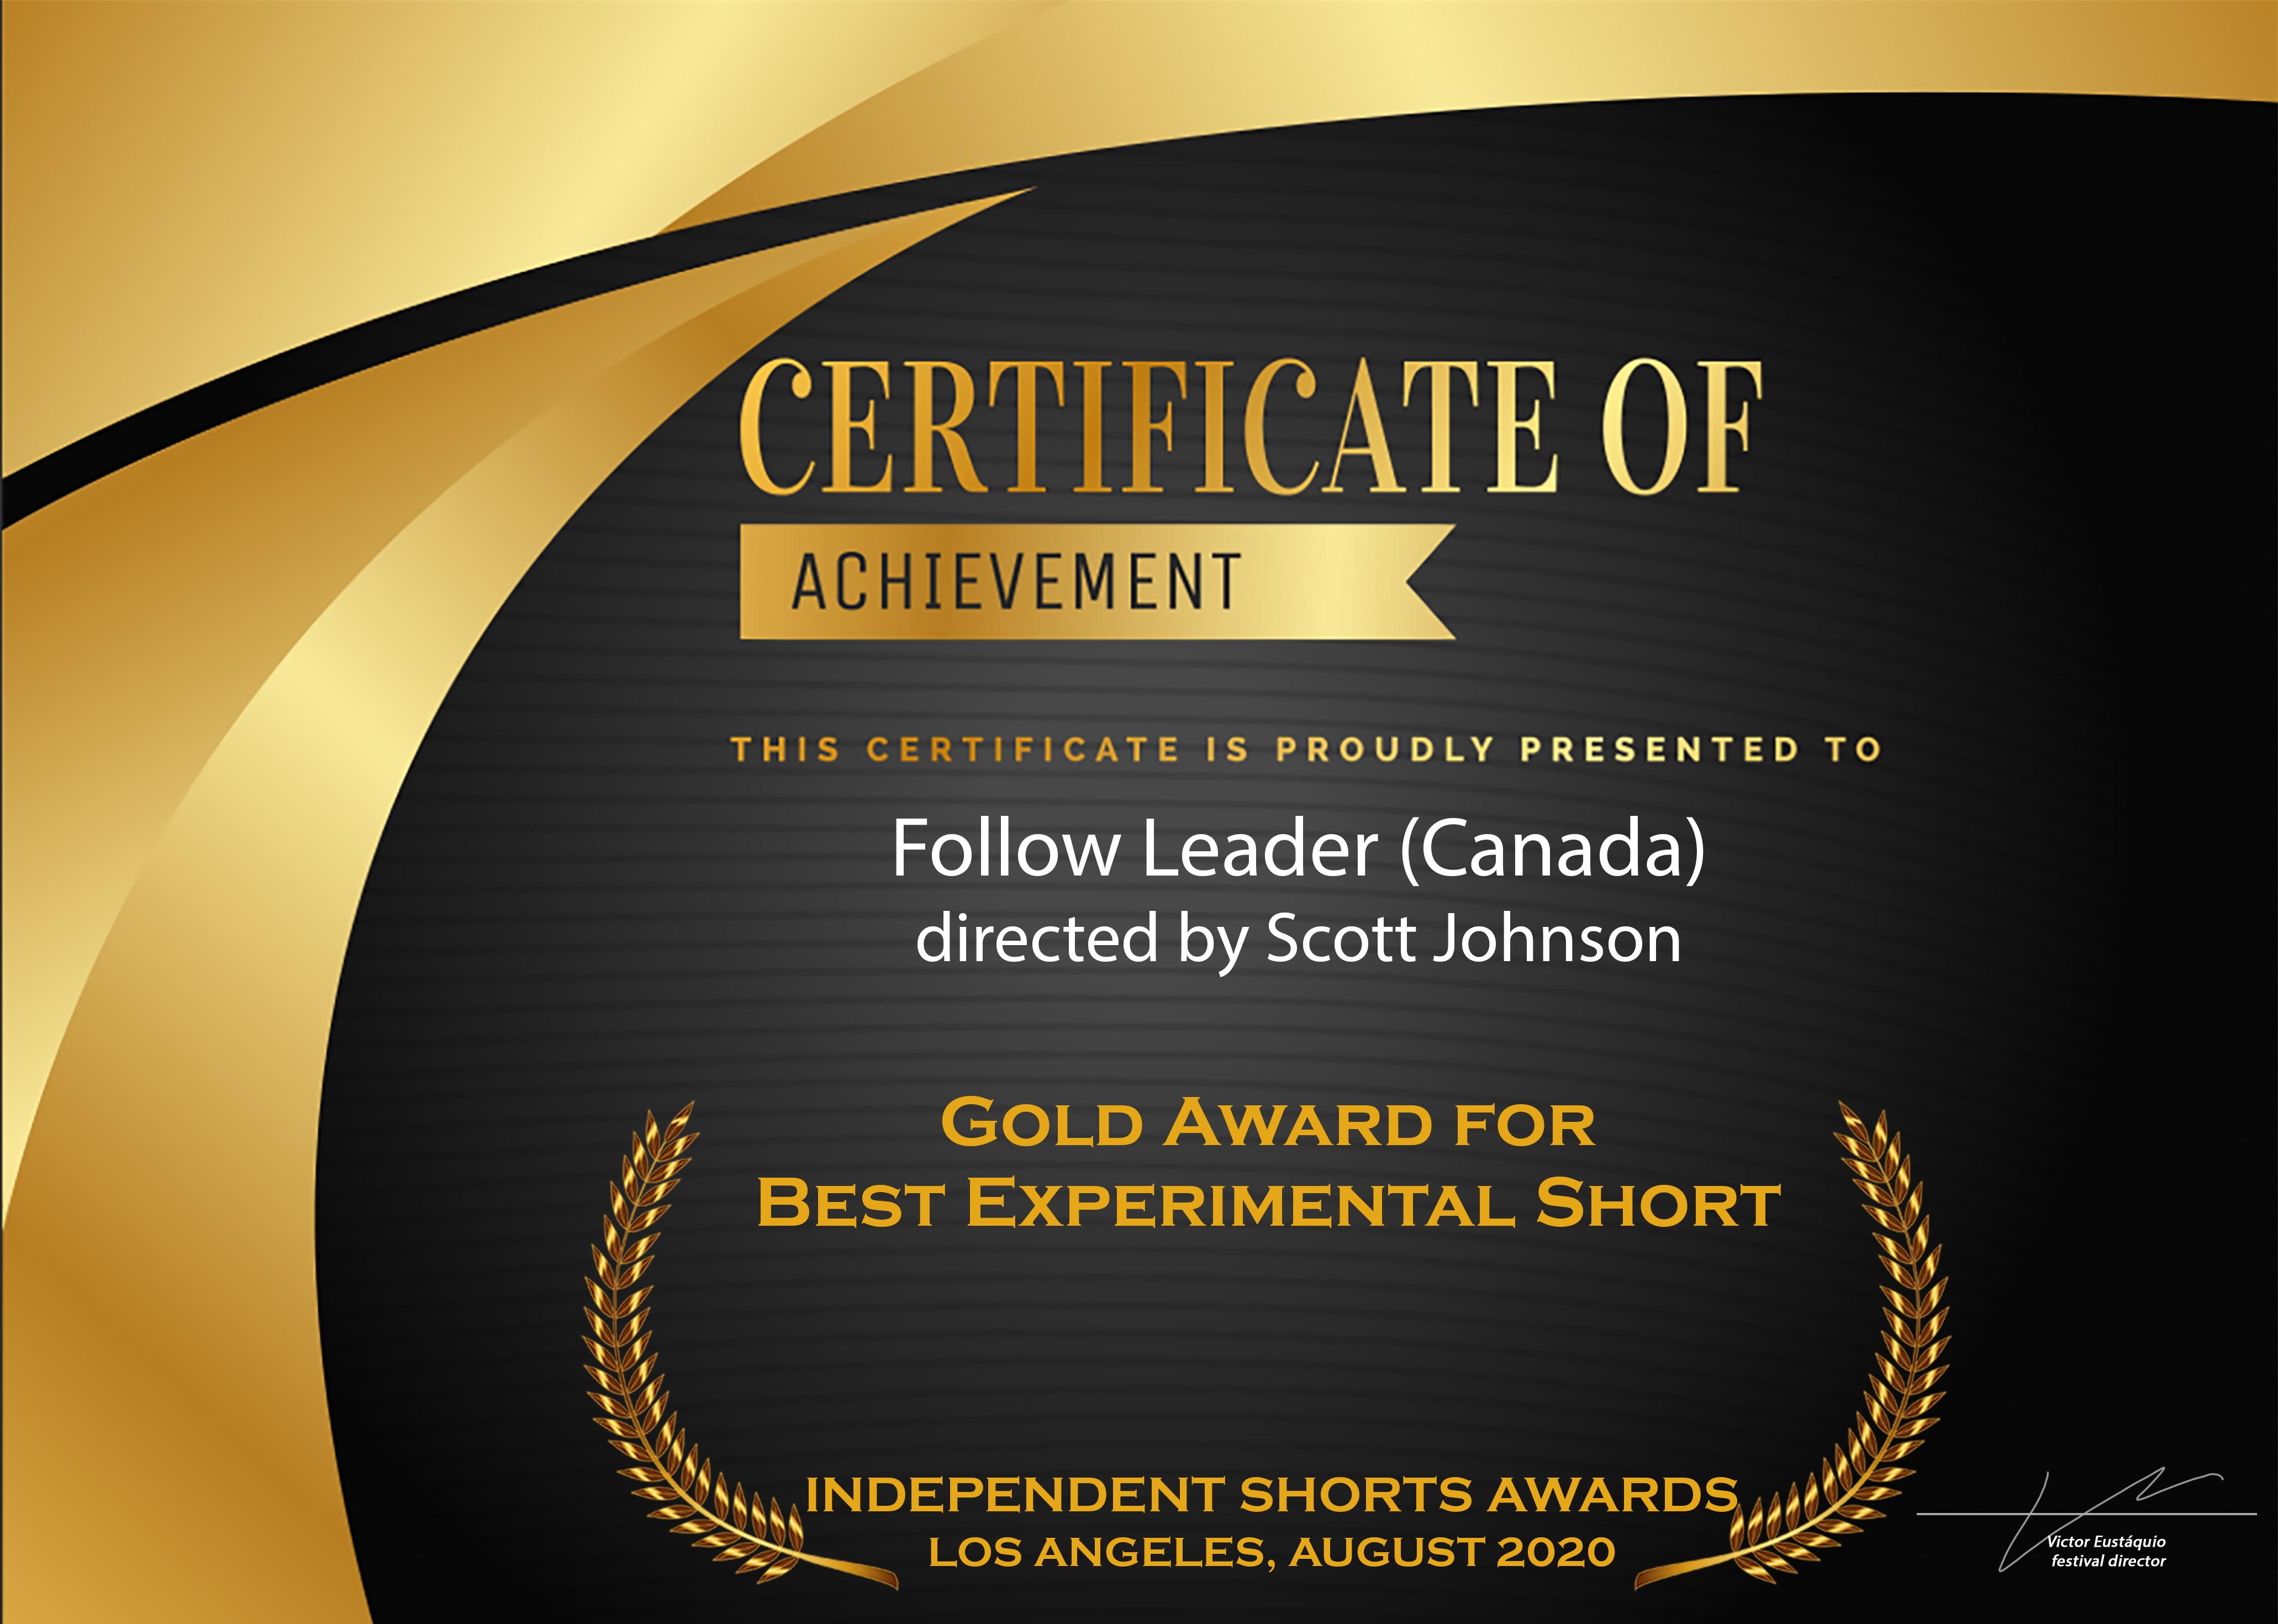 Gold Award - Best Experimental